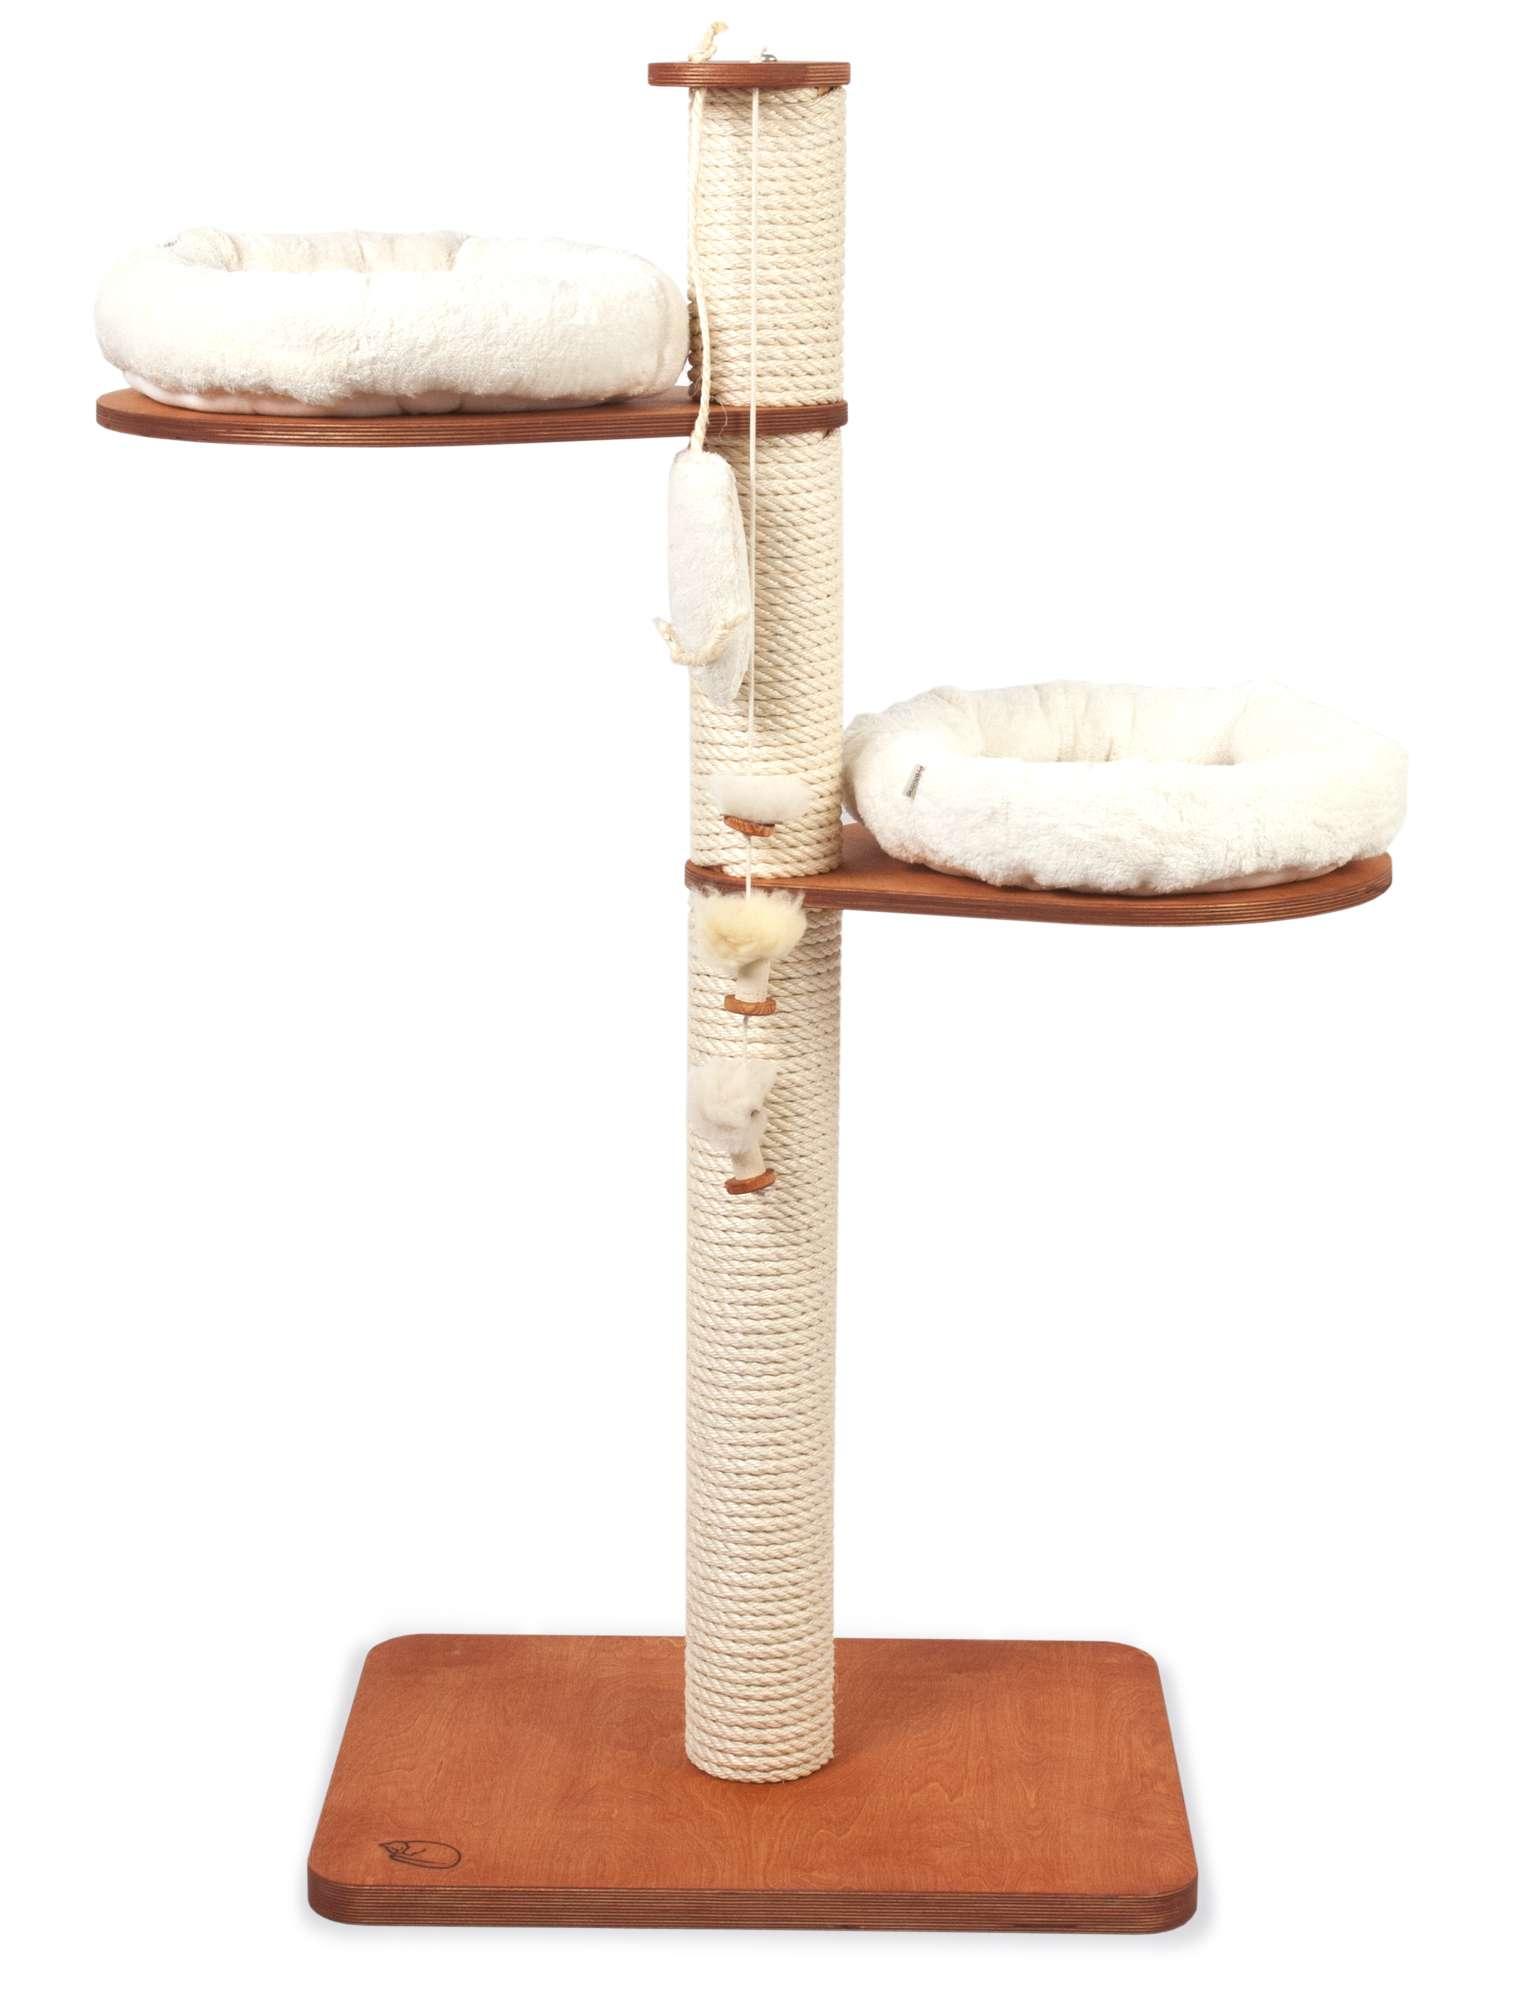 kratzbaum modell boris | 1-stamm kratzbaum | kratzbÄume | profeline